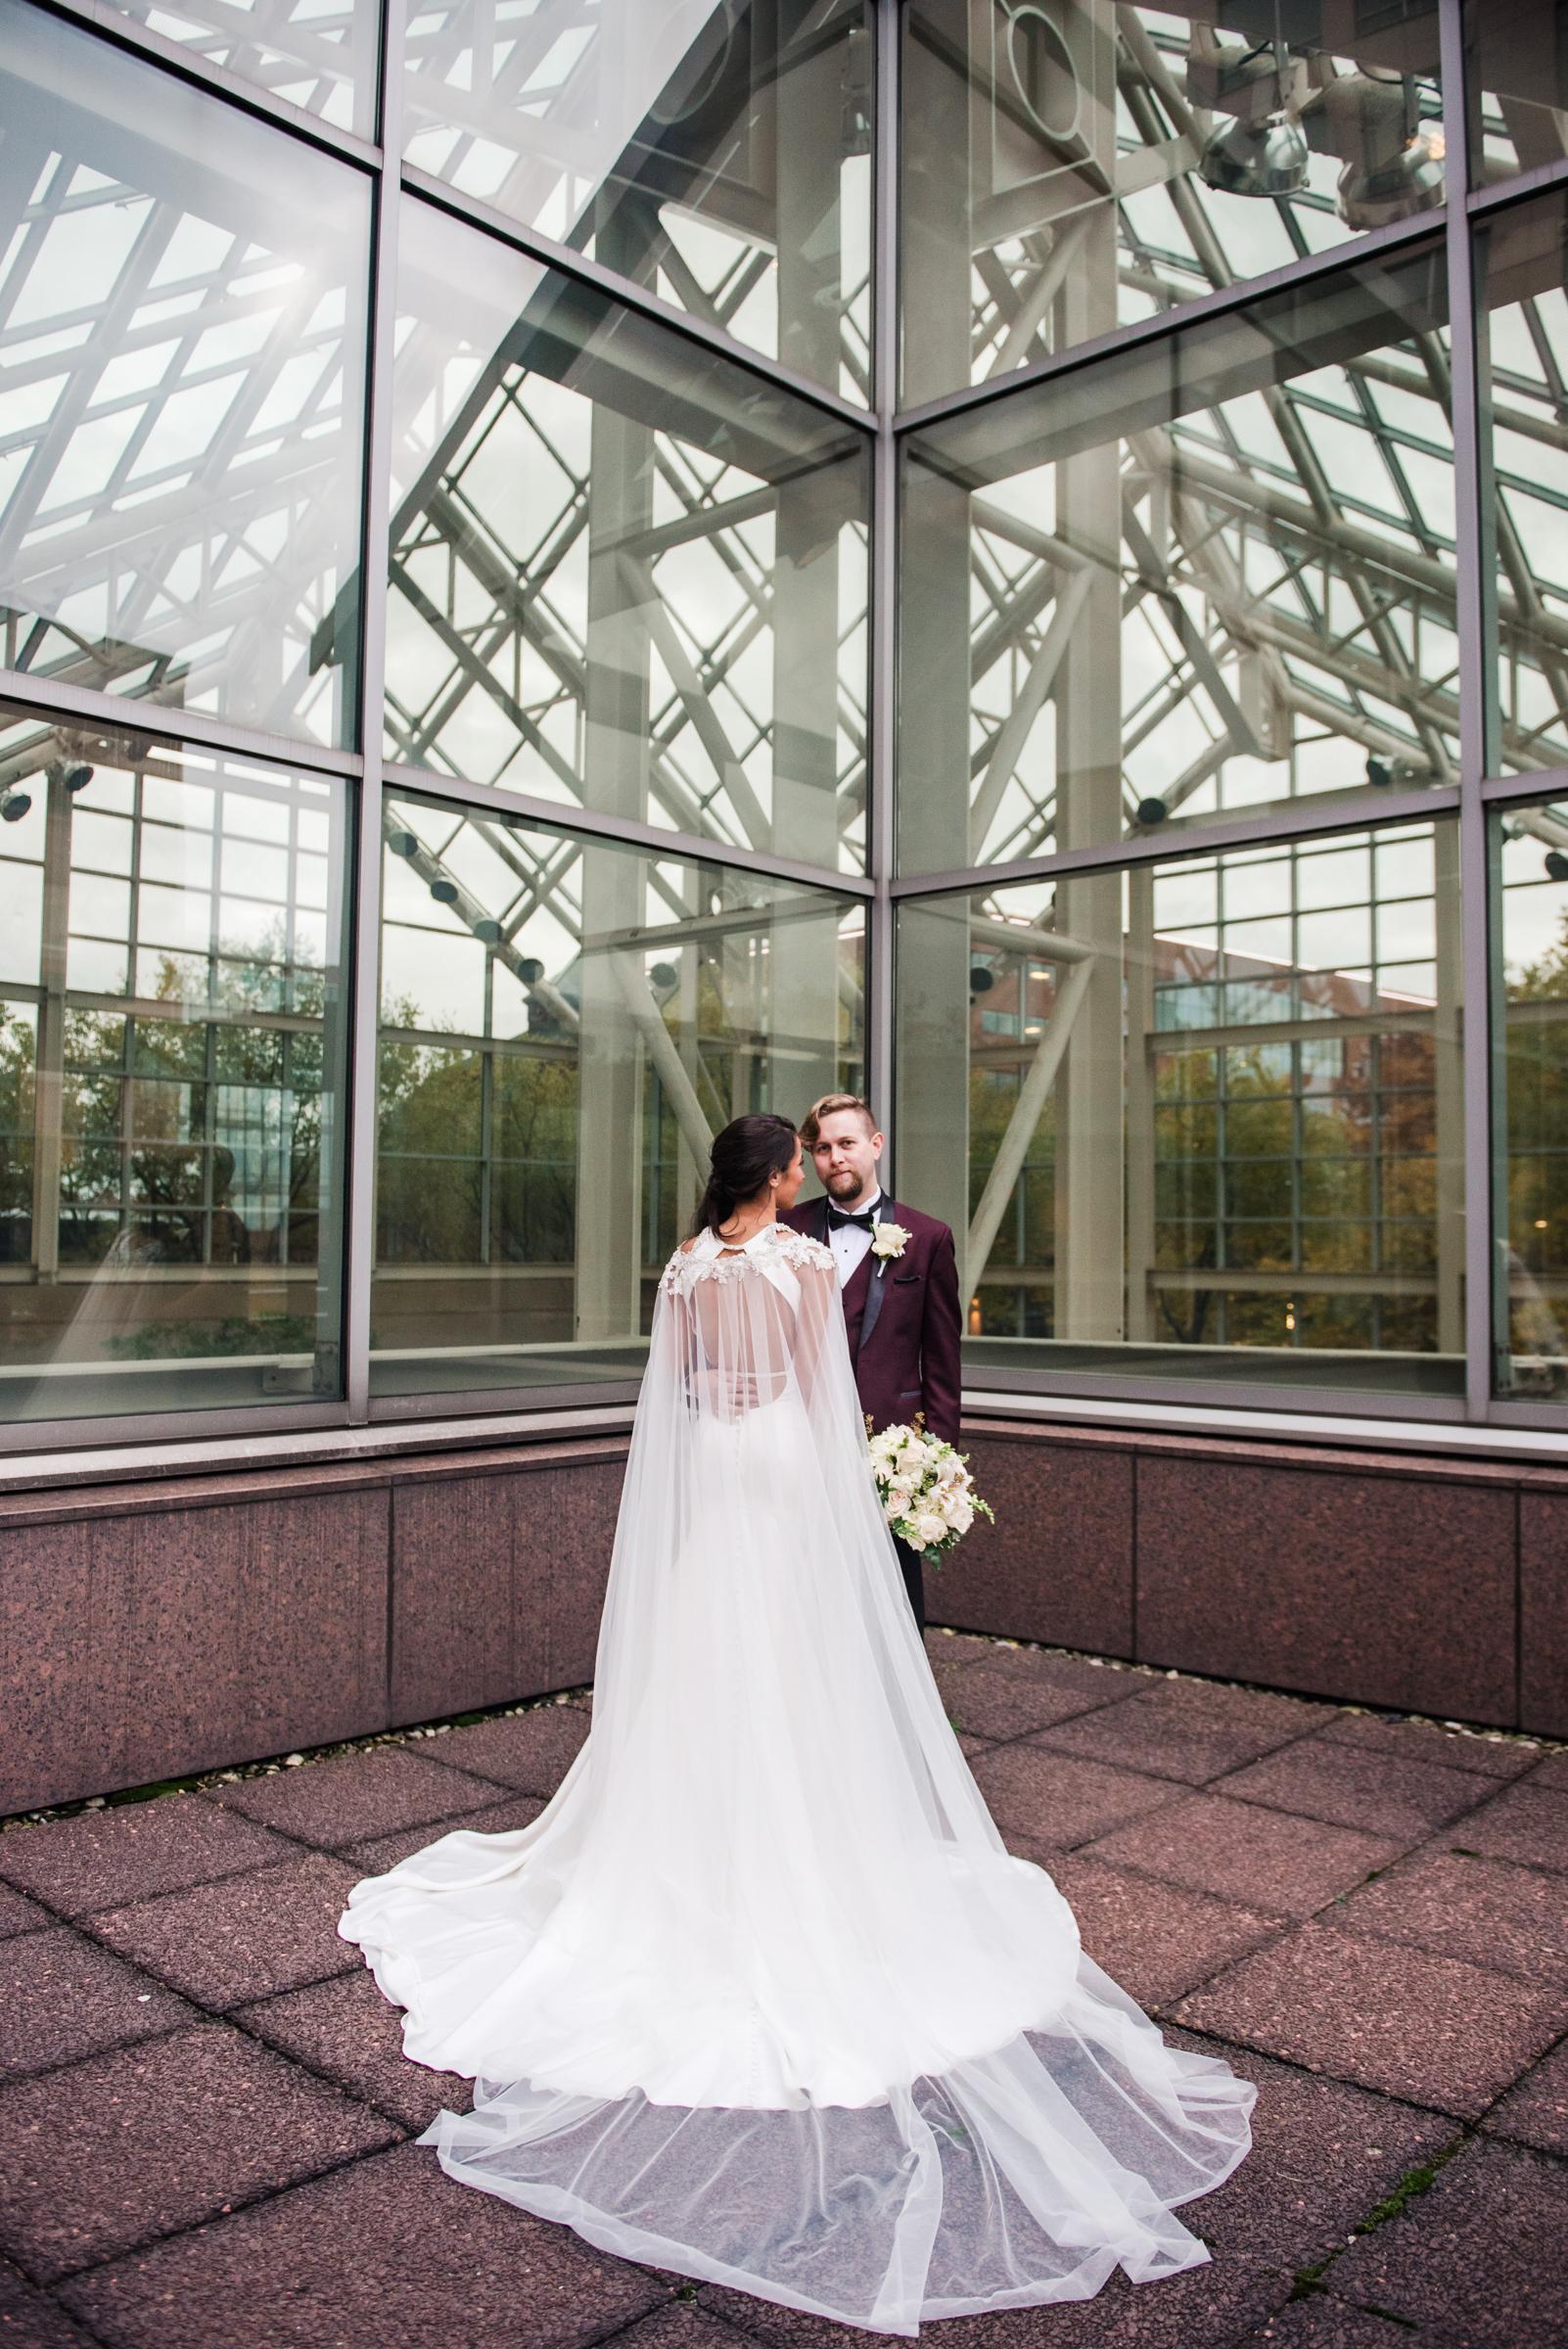 Wintergarden_by_Monroes_Rochester_Wedding_JILL_STUDIO_Rochester_NY_Photographer_174401.jpg